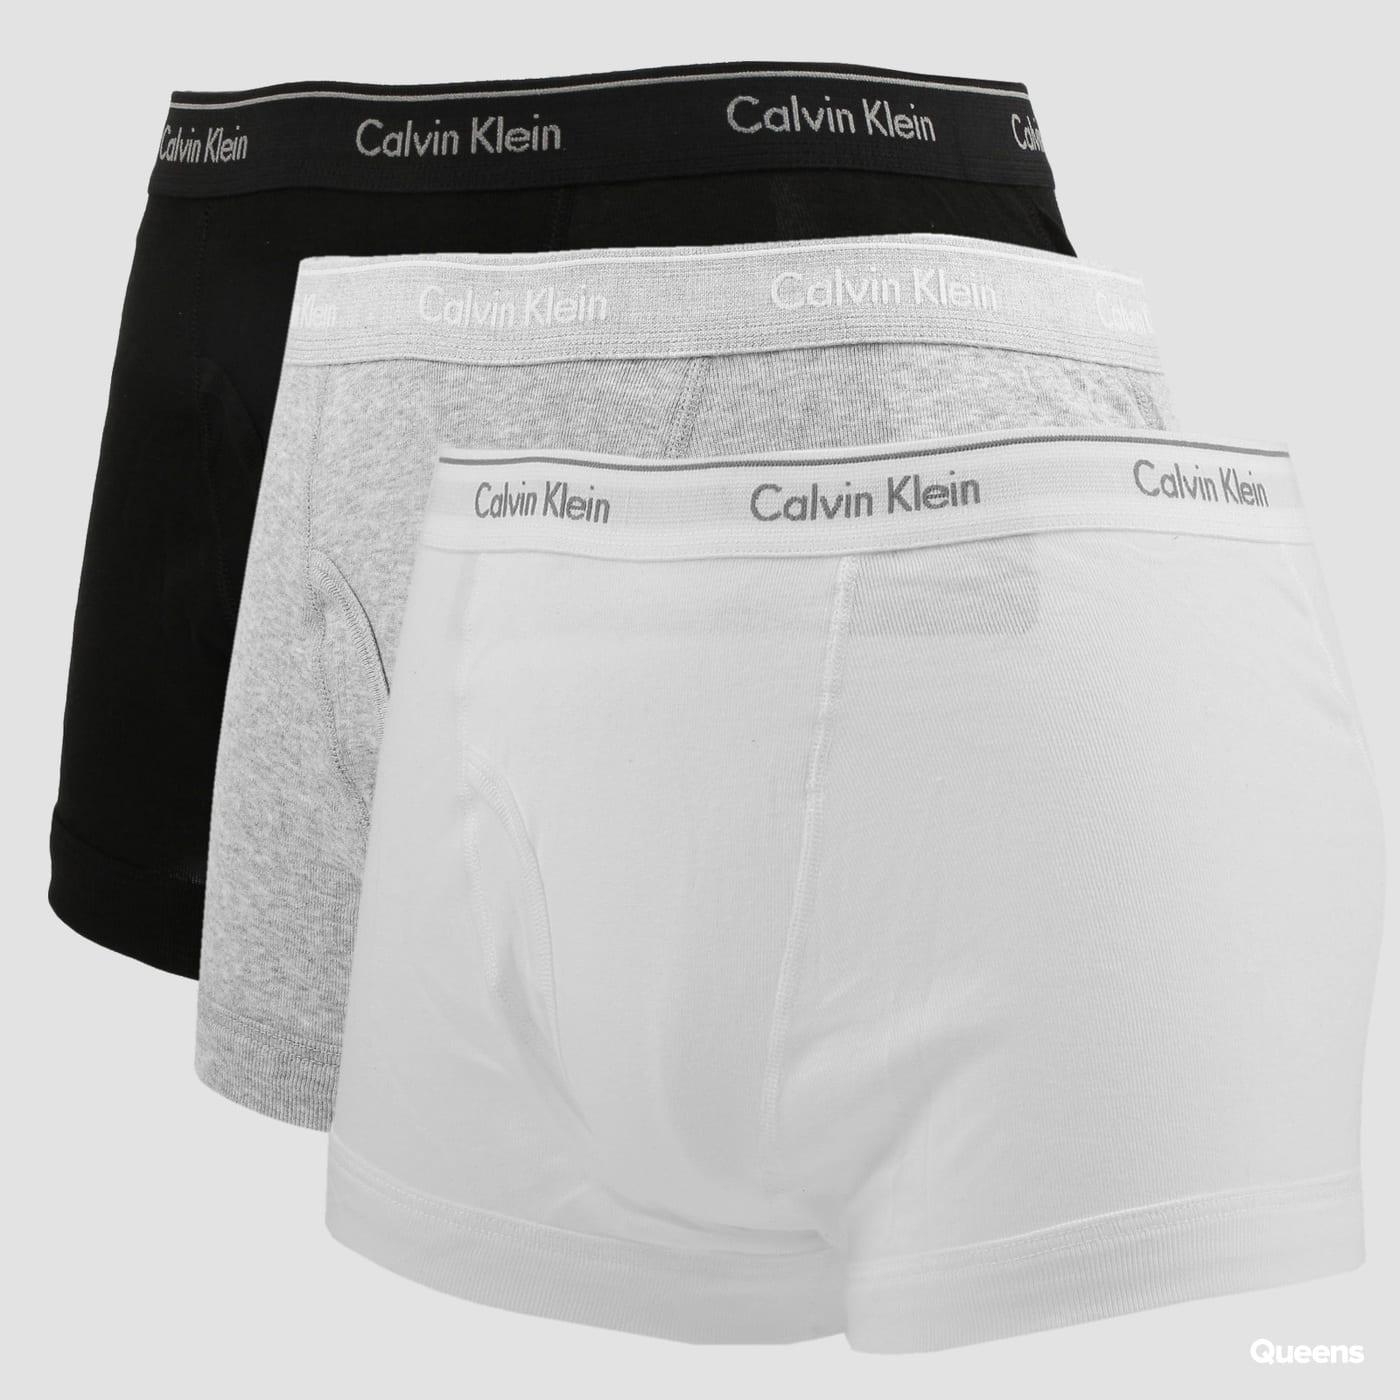 Calvin Klein 3 Pack Classic Fit Trunks C/O biele / čierne / melange šedé